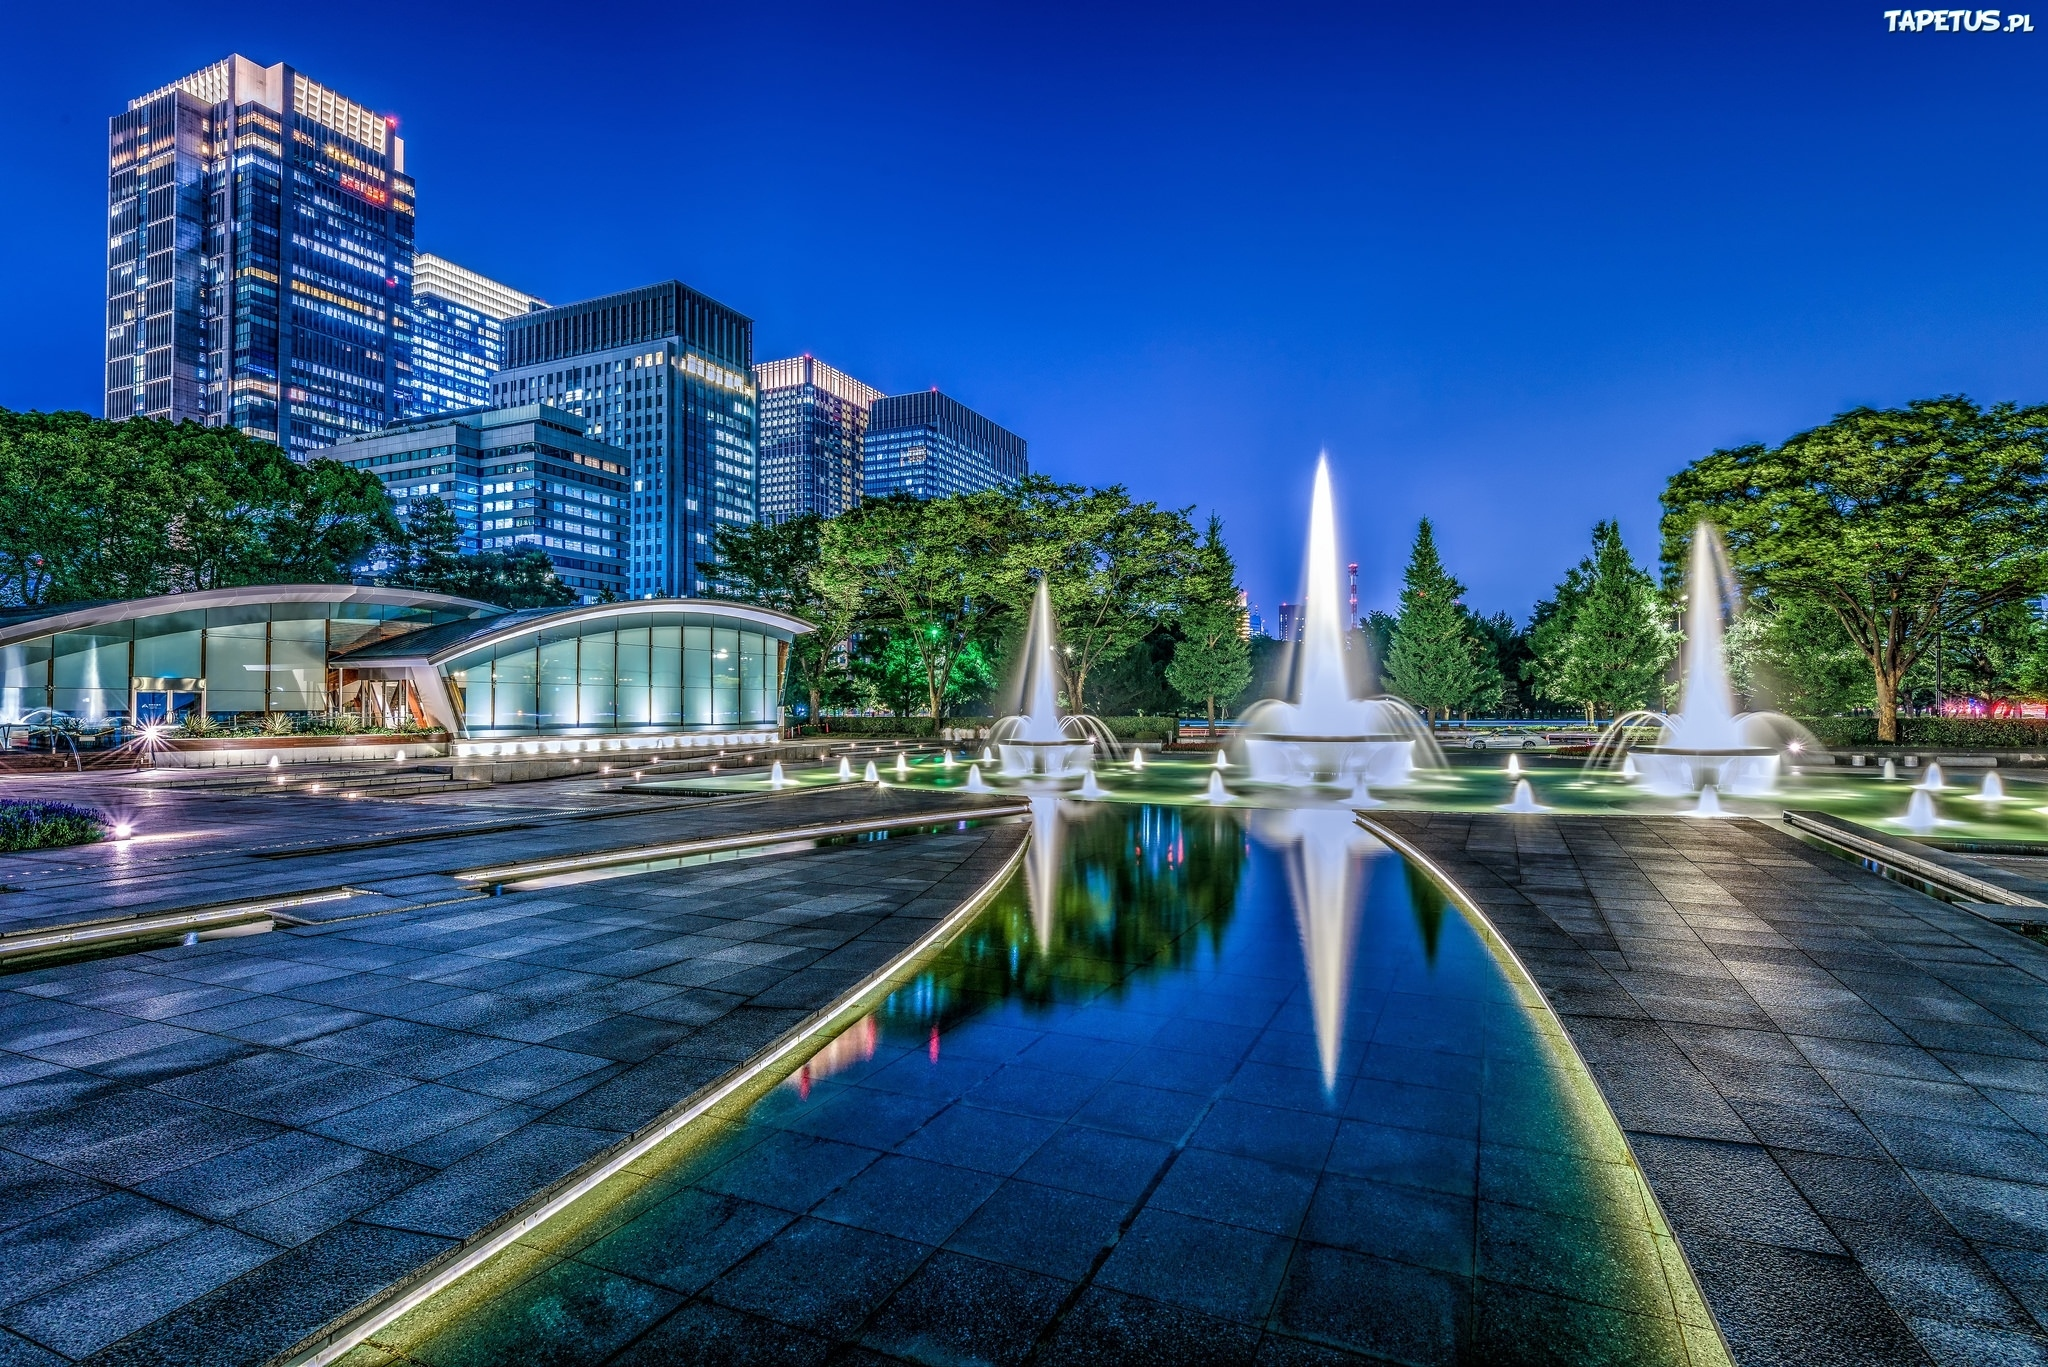 235049_miasto-noc-tokio-fontanna-wadakura.jpg